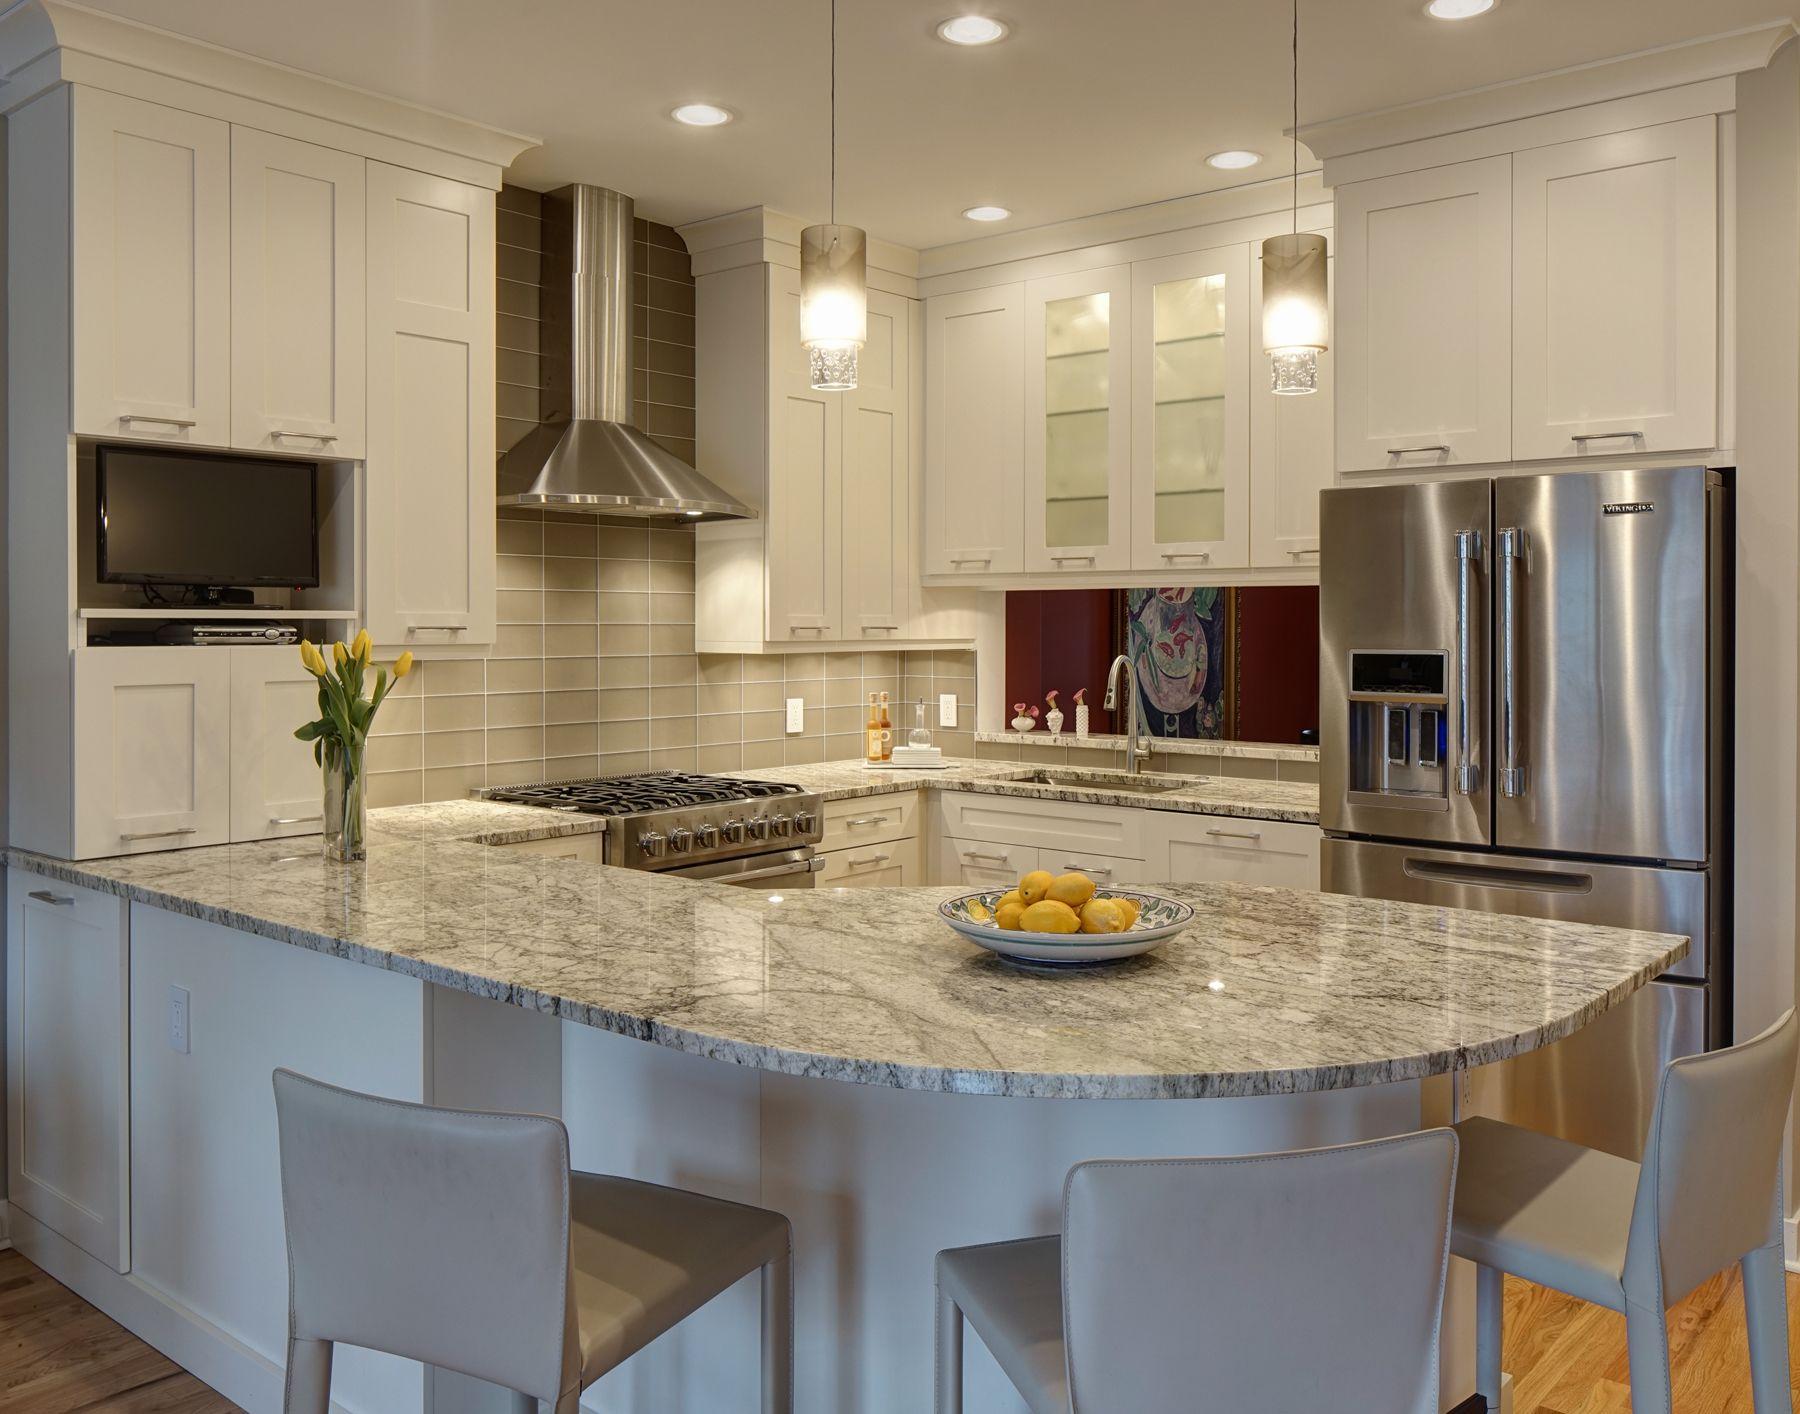 Kitchen Bath Home Remodeling Chicago Drury Design Curved Kitchen Kitchen Remodel Small Open Concept Kitchen